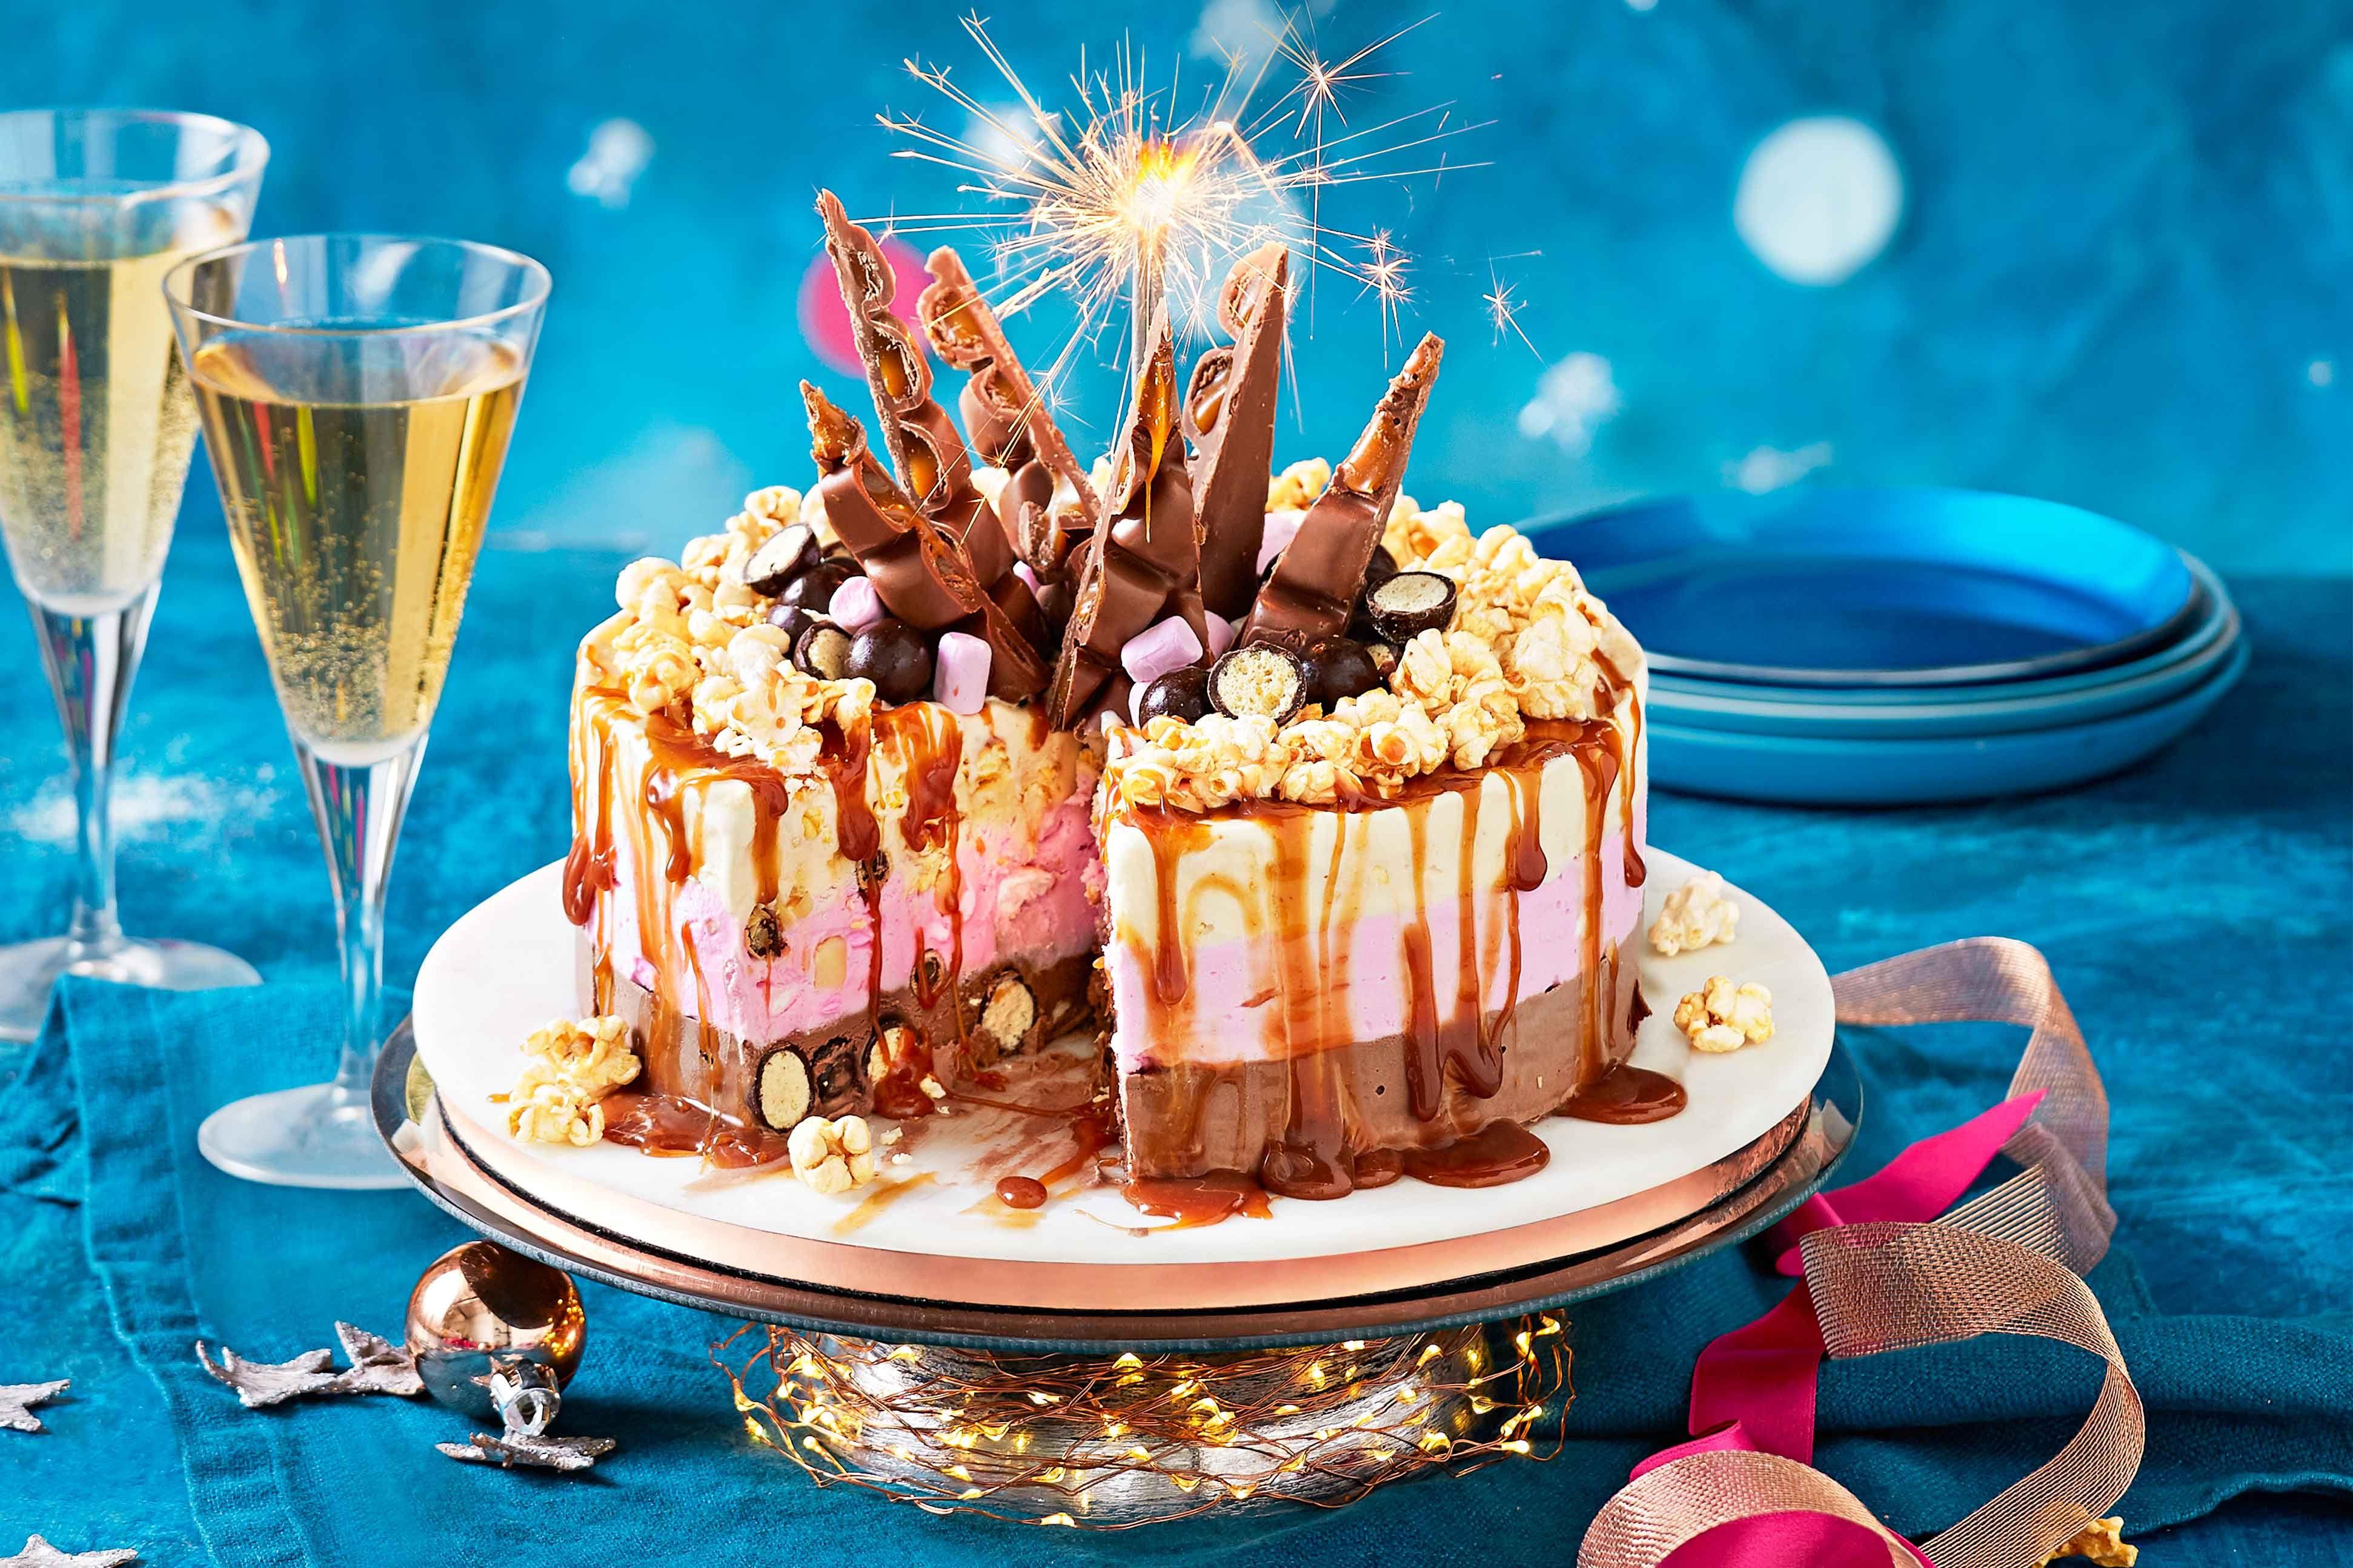 Easy stepbystep chococaramel popcorn icecream cake